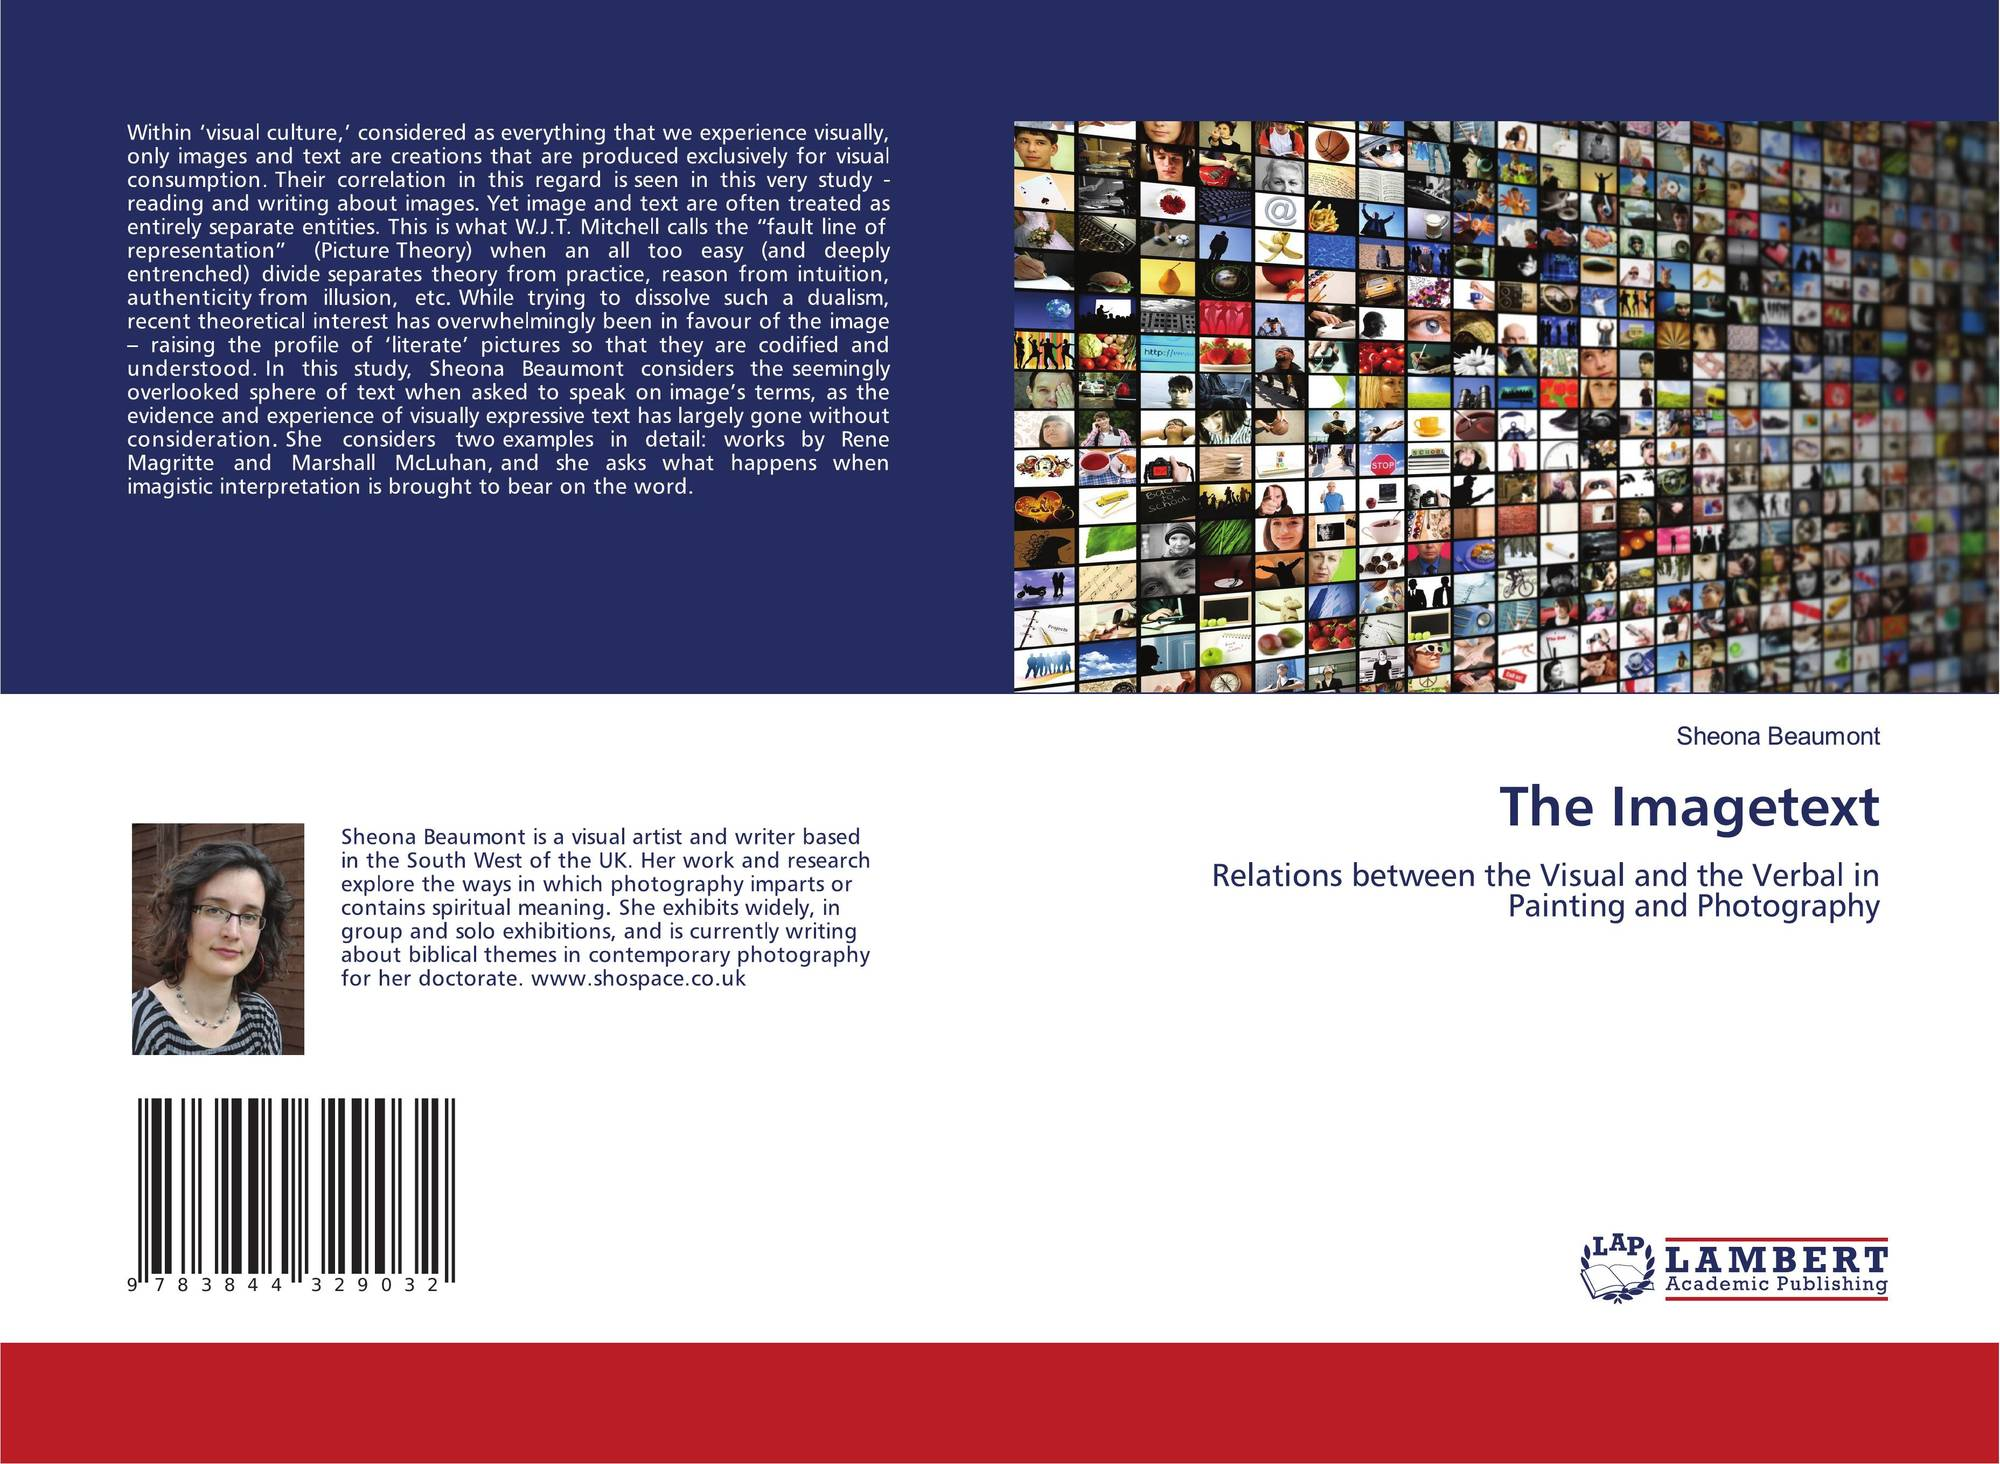 LAP LAMBERT Academic Publishing - 157452 Products | Page 13973 |